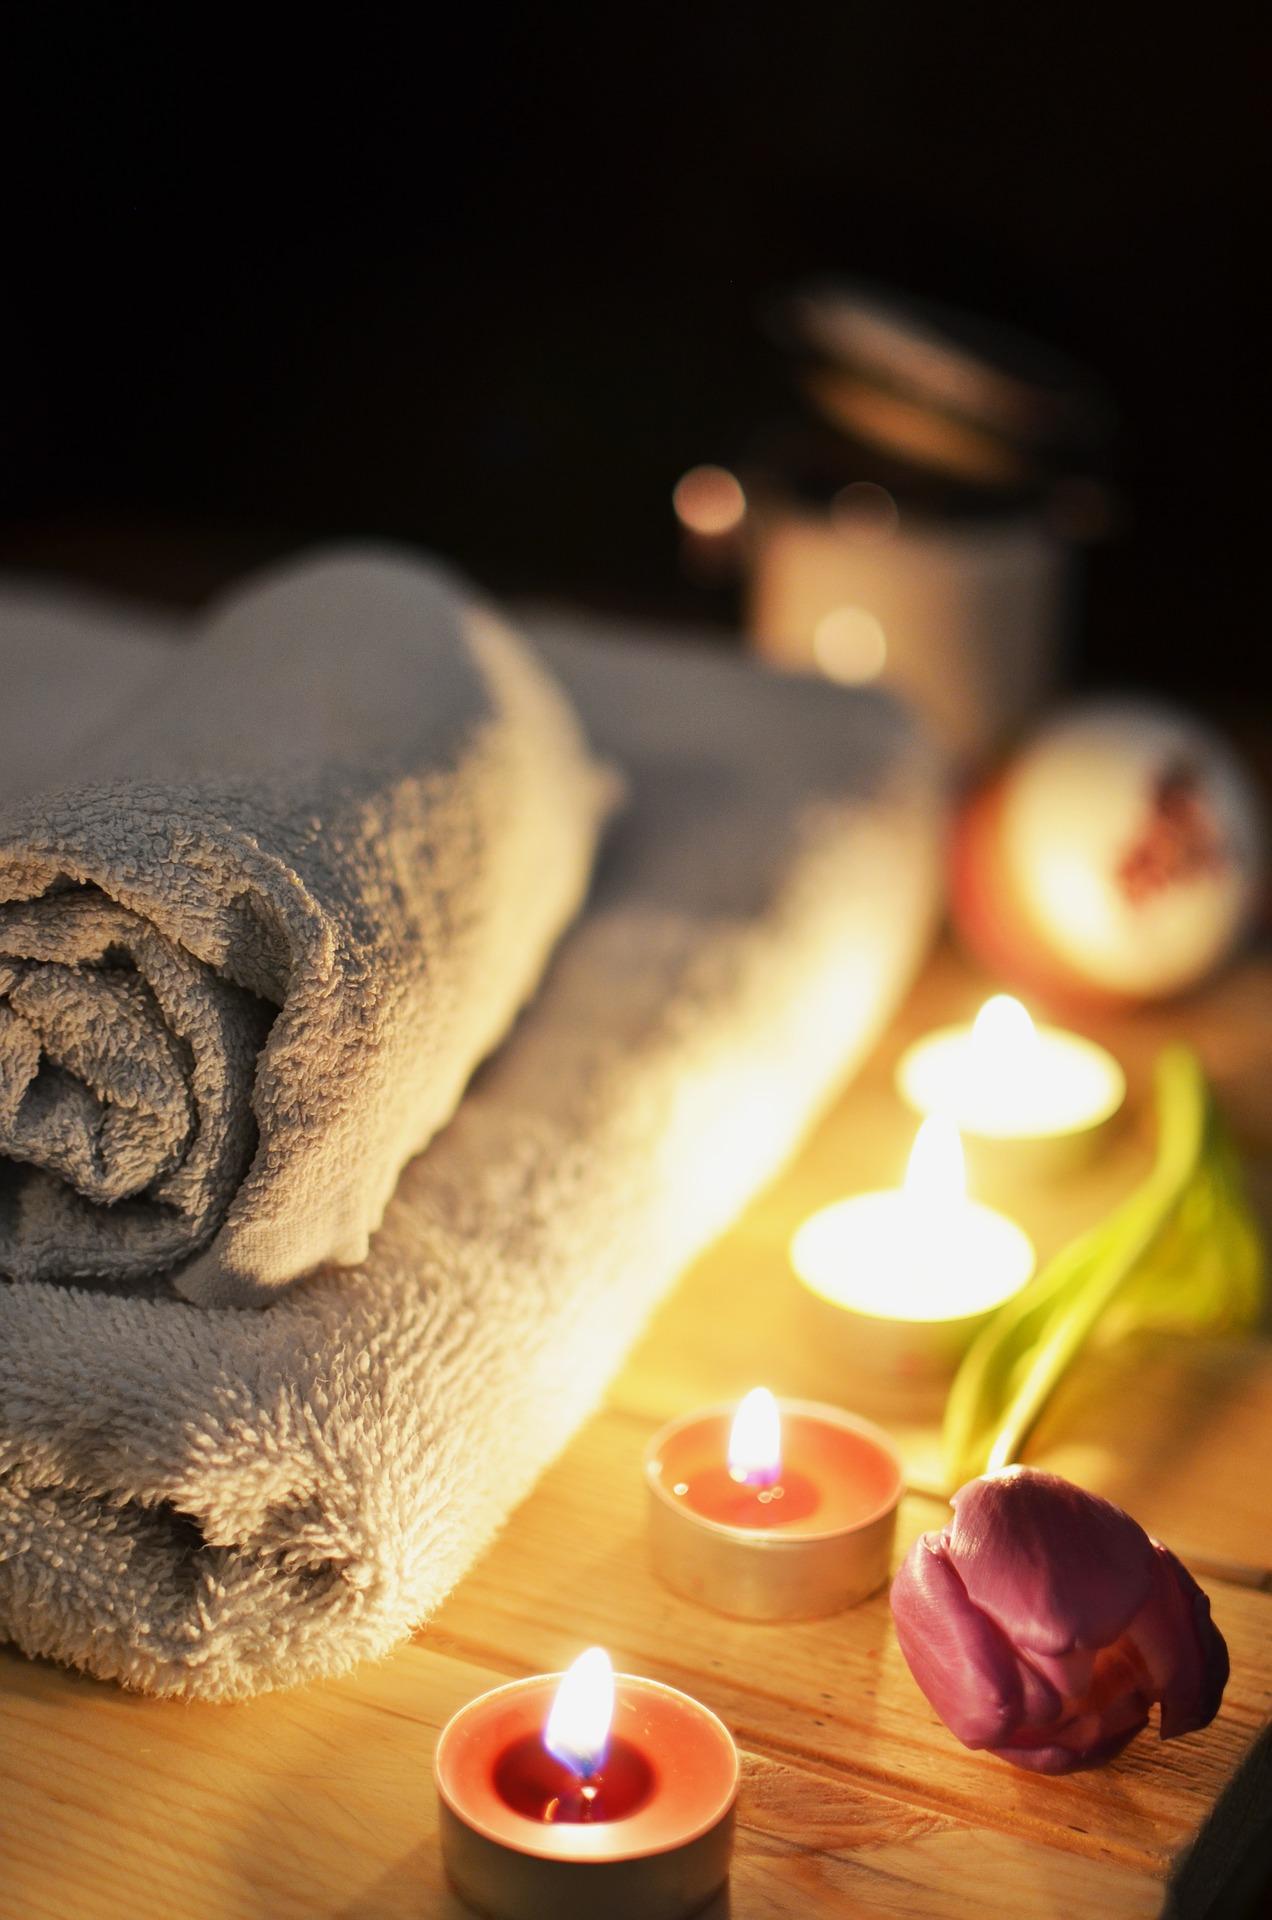 Towels & Self Care